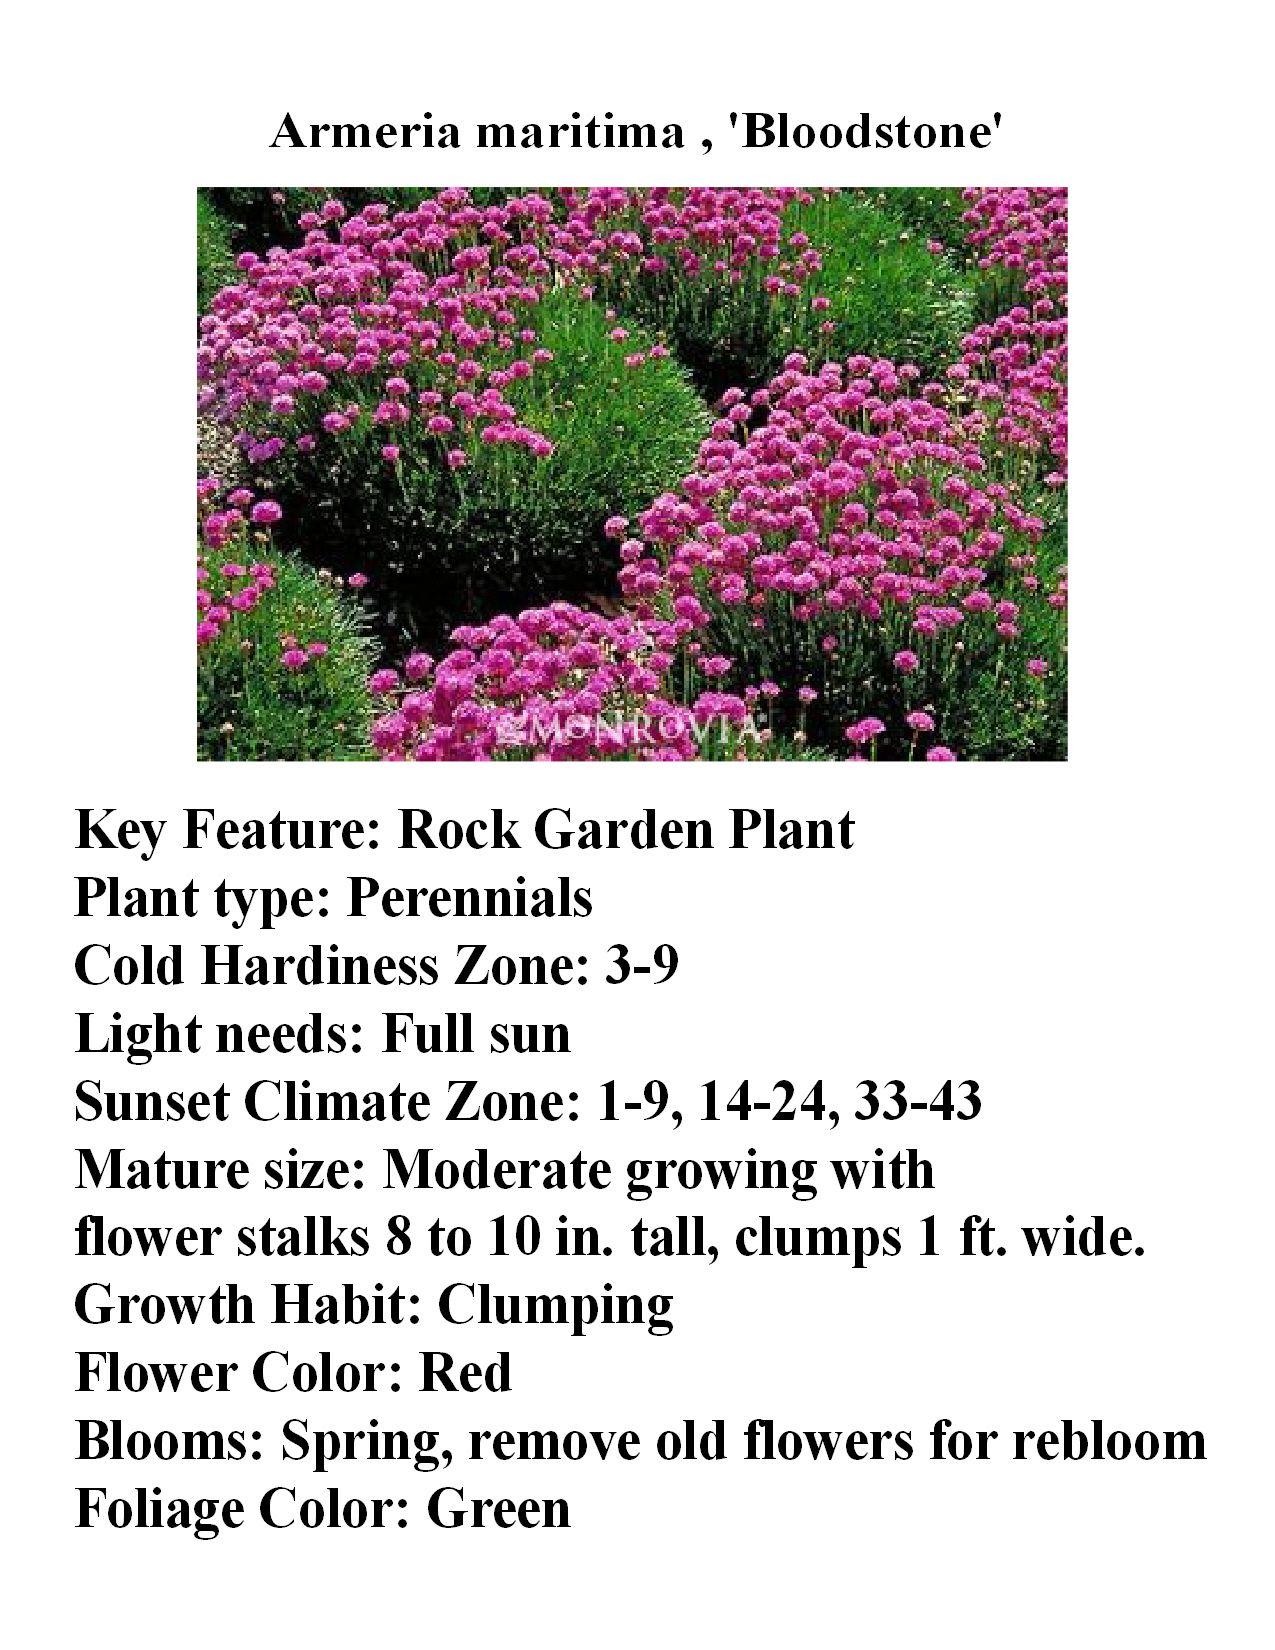 Armeria Maritina A Great Border Plant That Grows In A 6 10 Tall